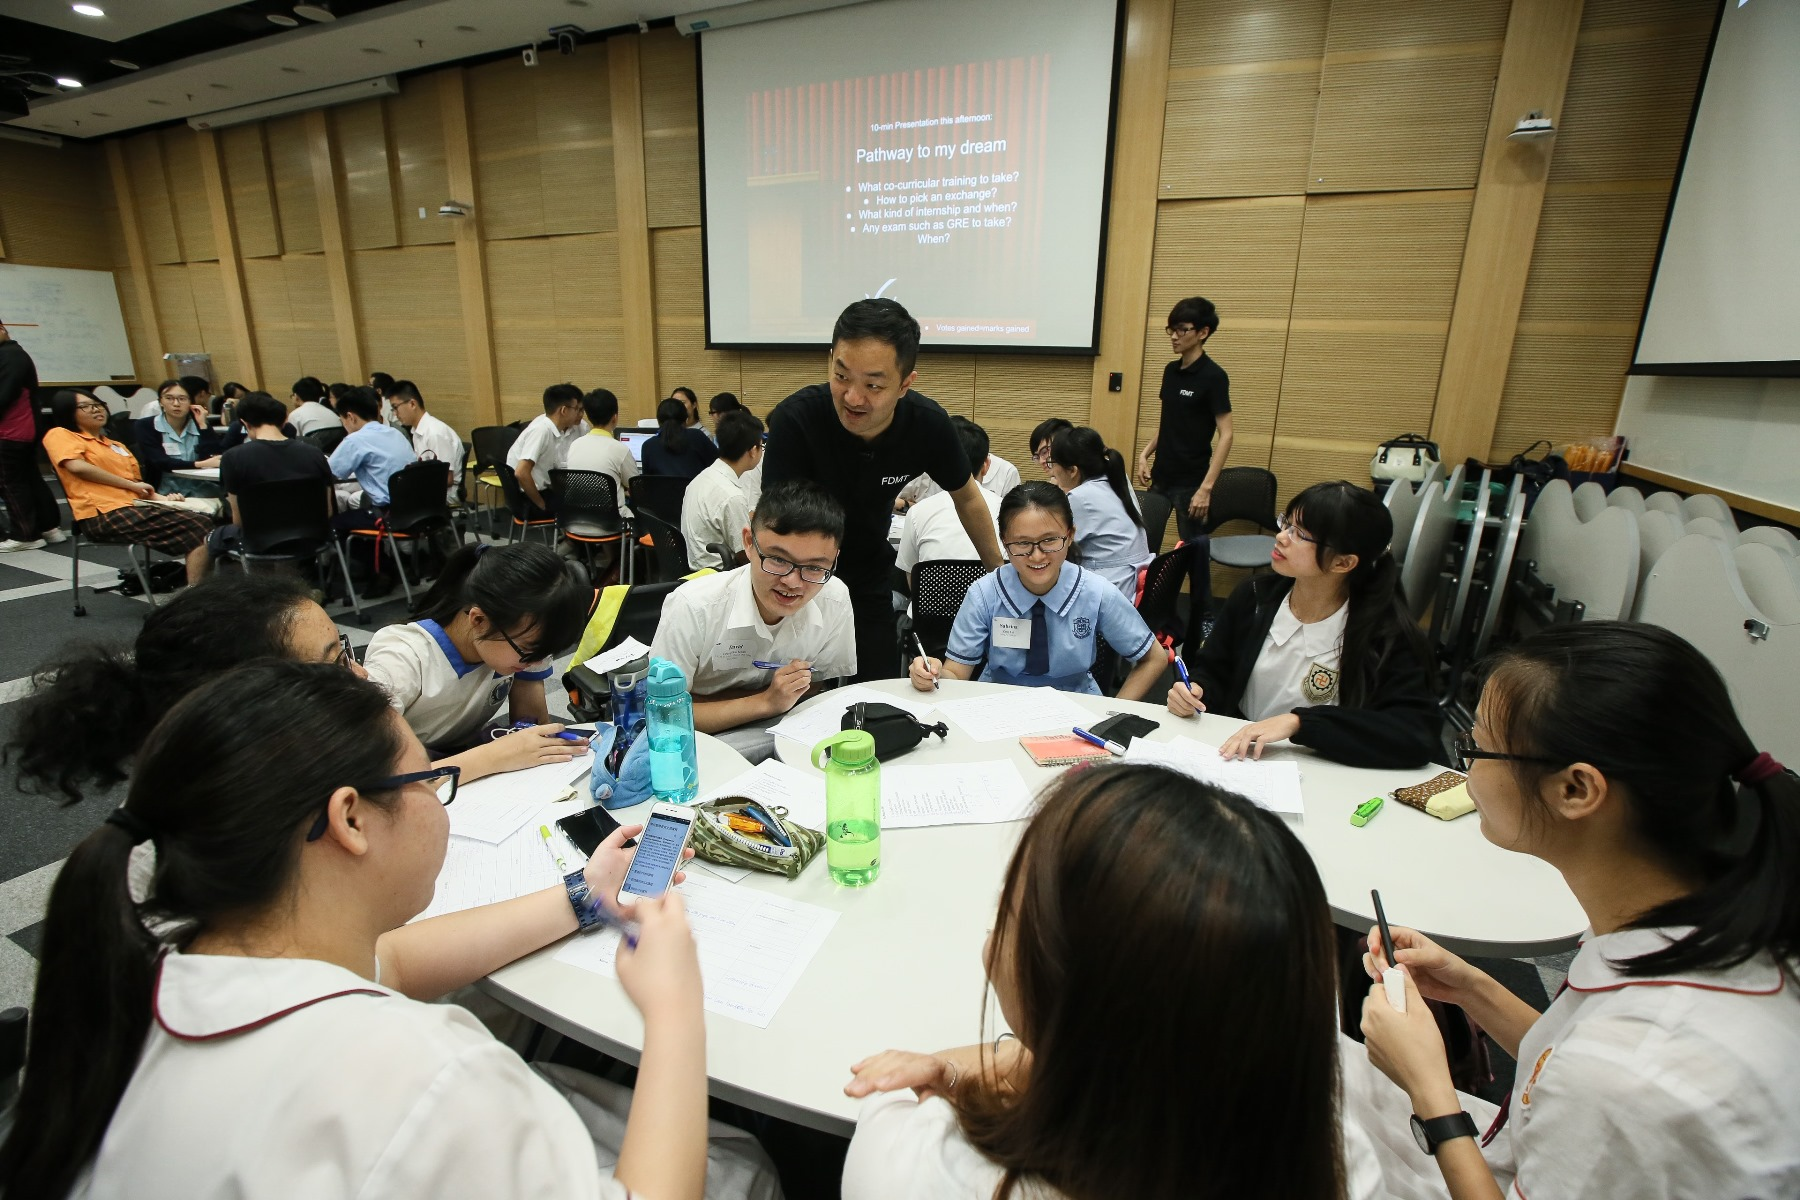 http://www.npc.edu.hk/sites/default/files/img_2946.jpg